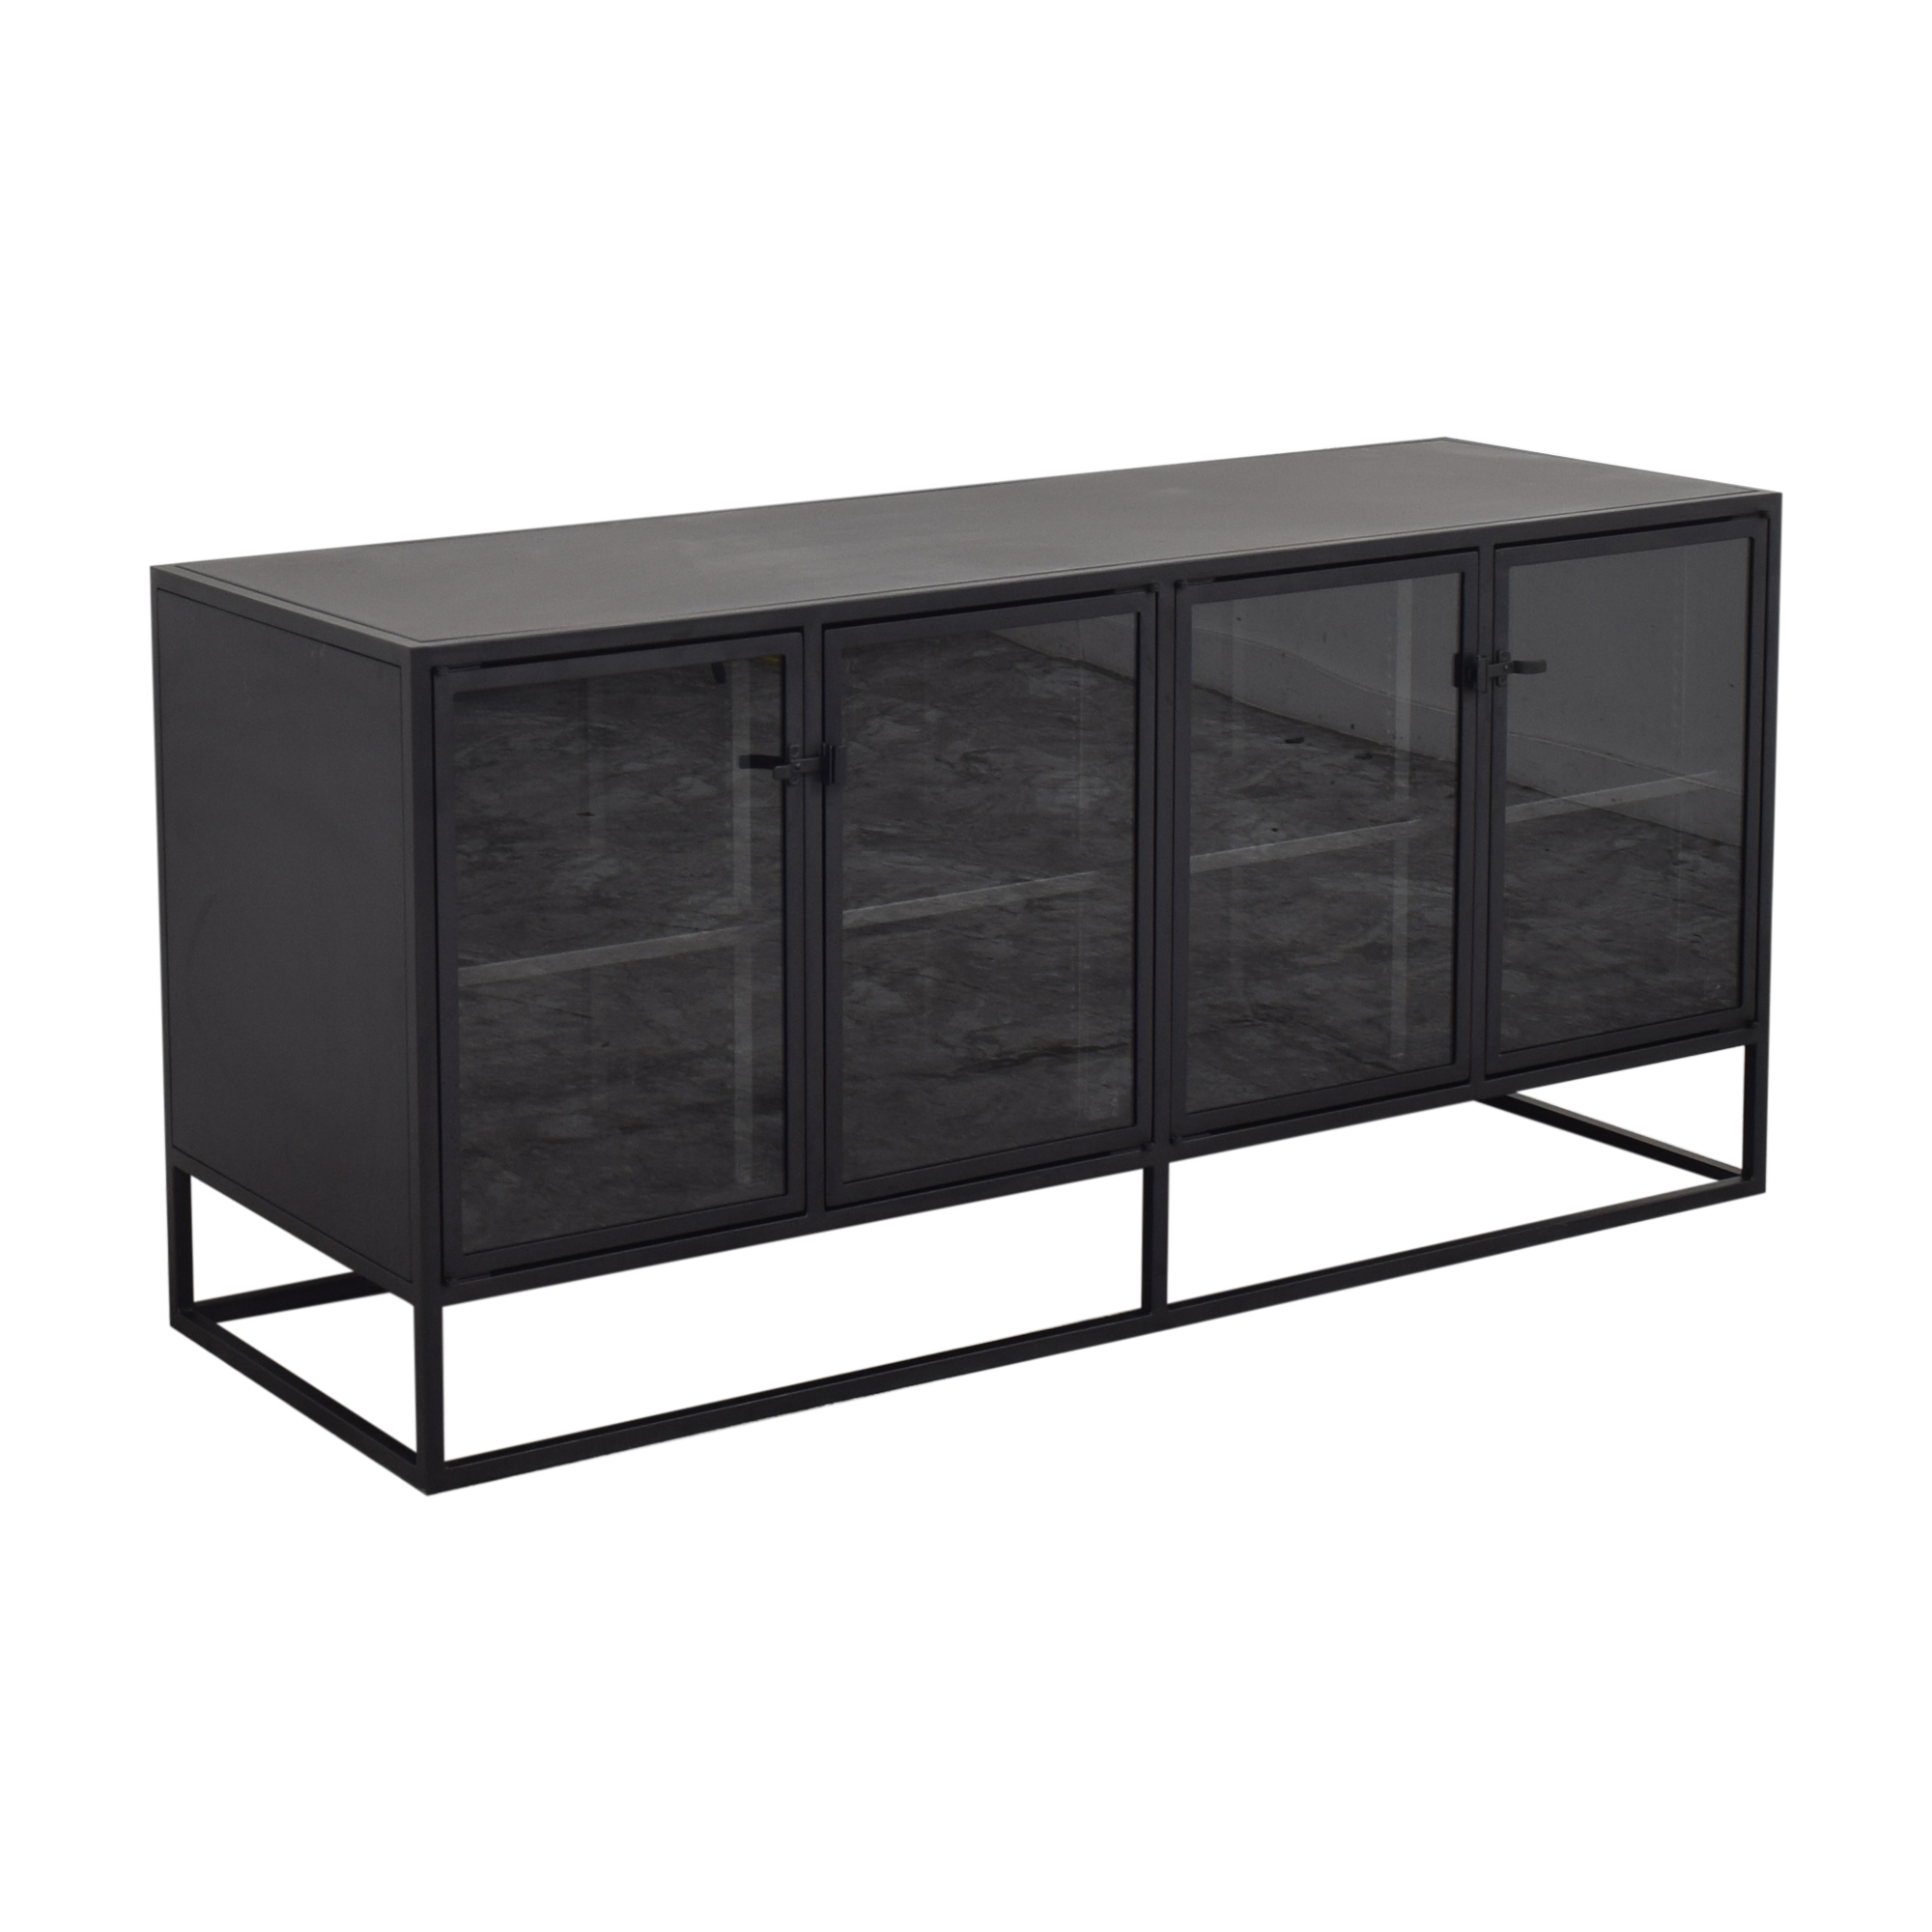 Crate & Barrel Casement Large Sideboard / Cabinets & Sideboards